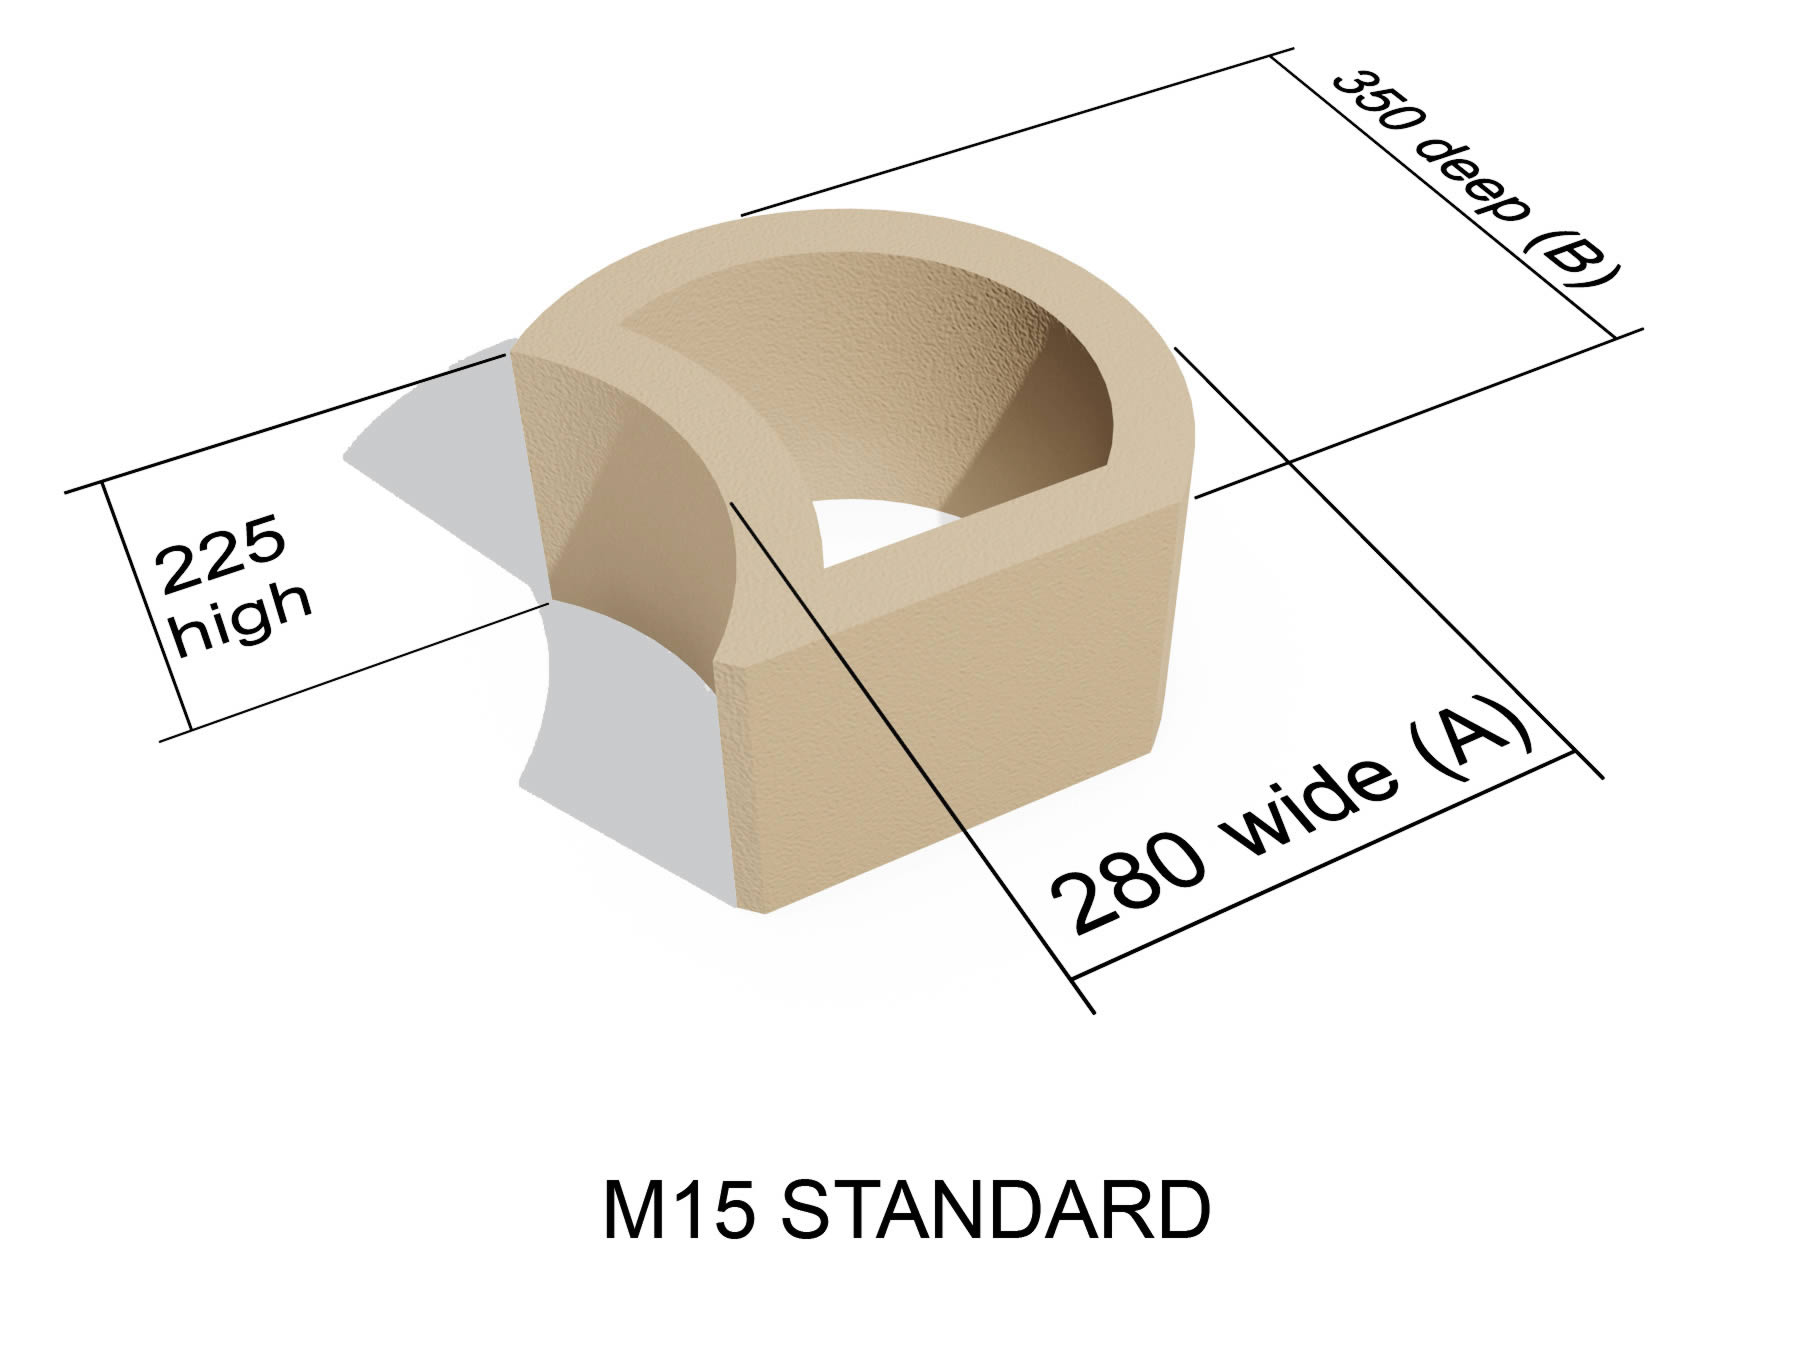 M15 Standard block